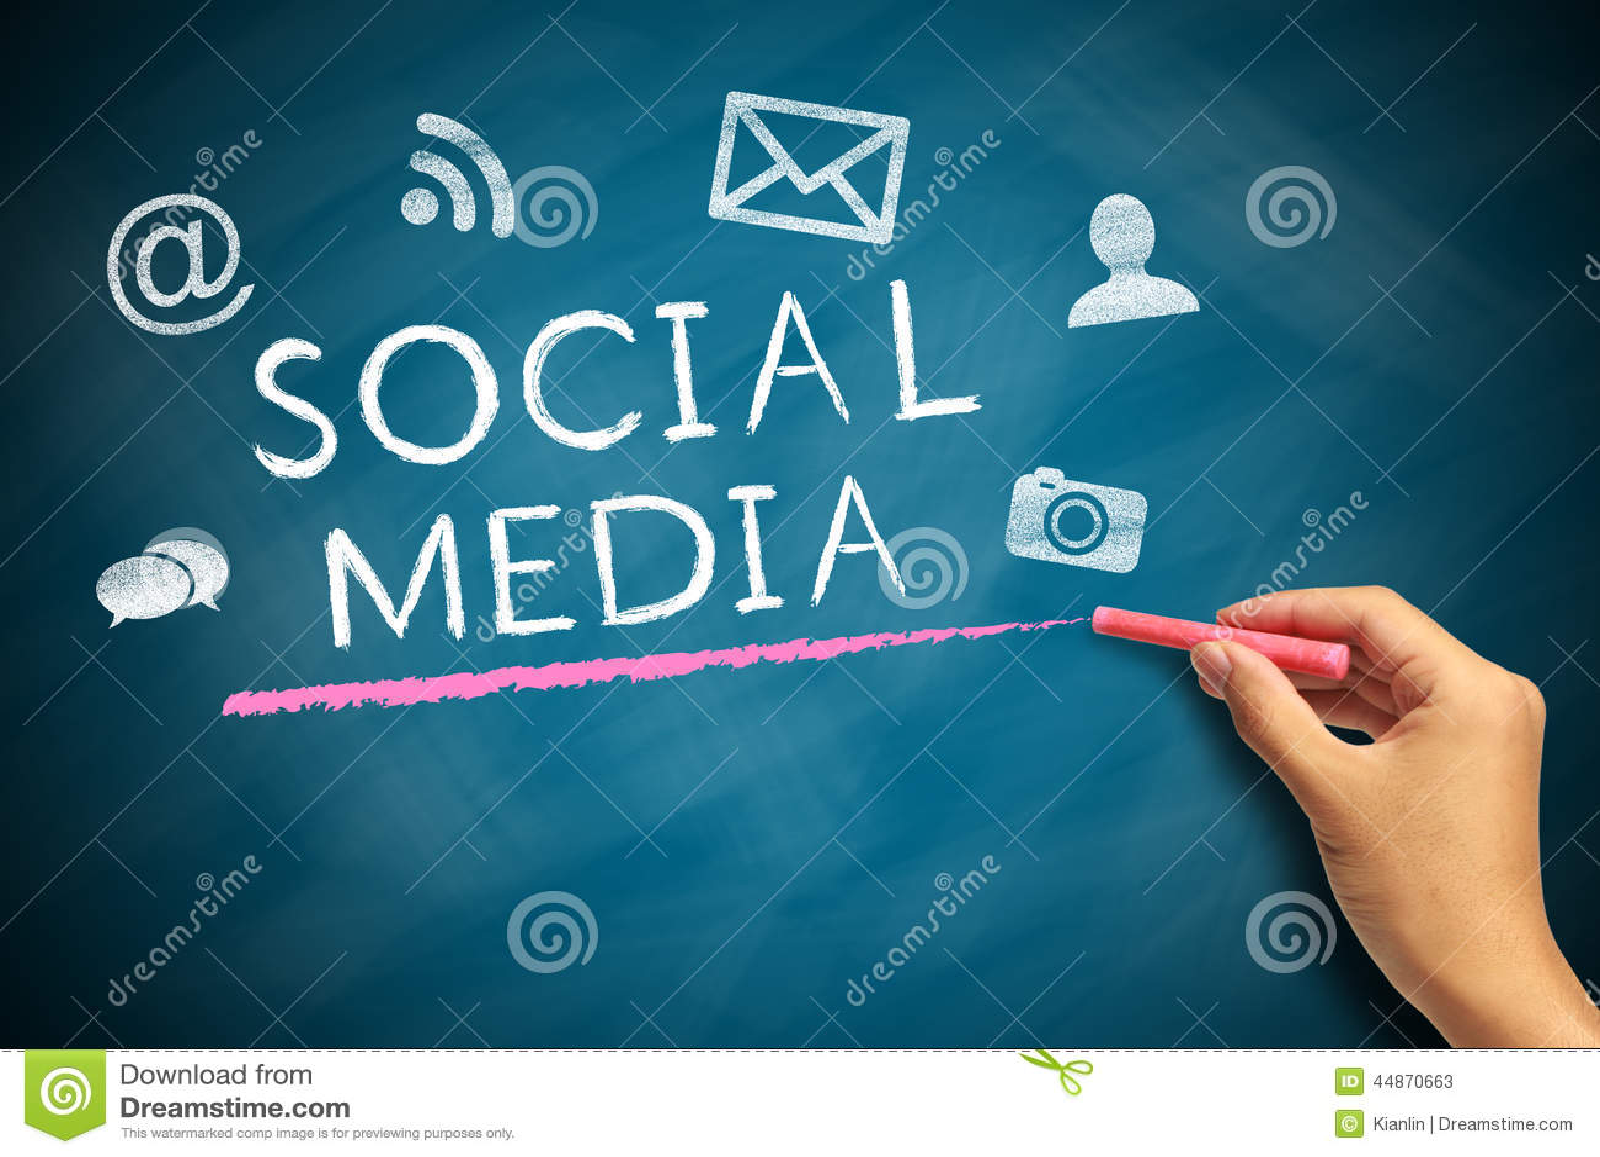 Sociaal media concept